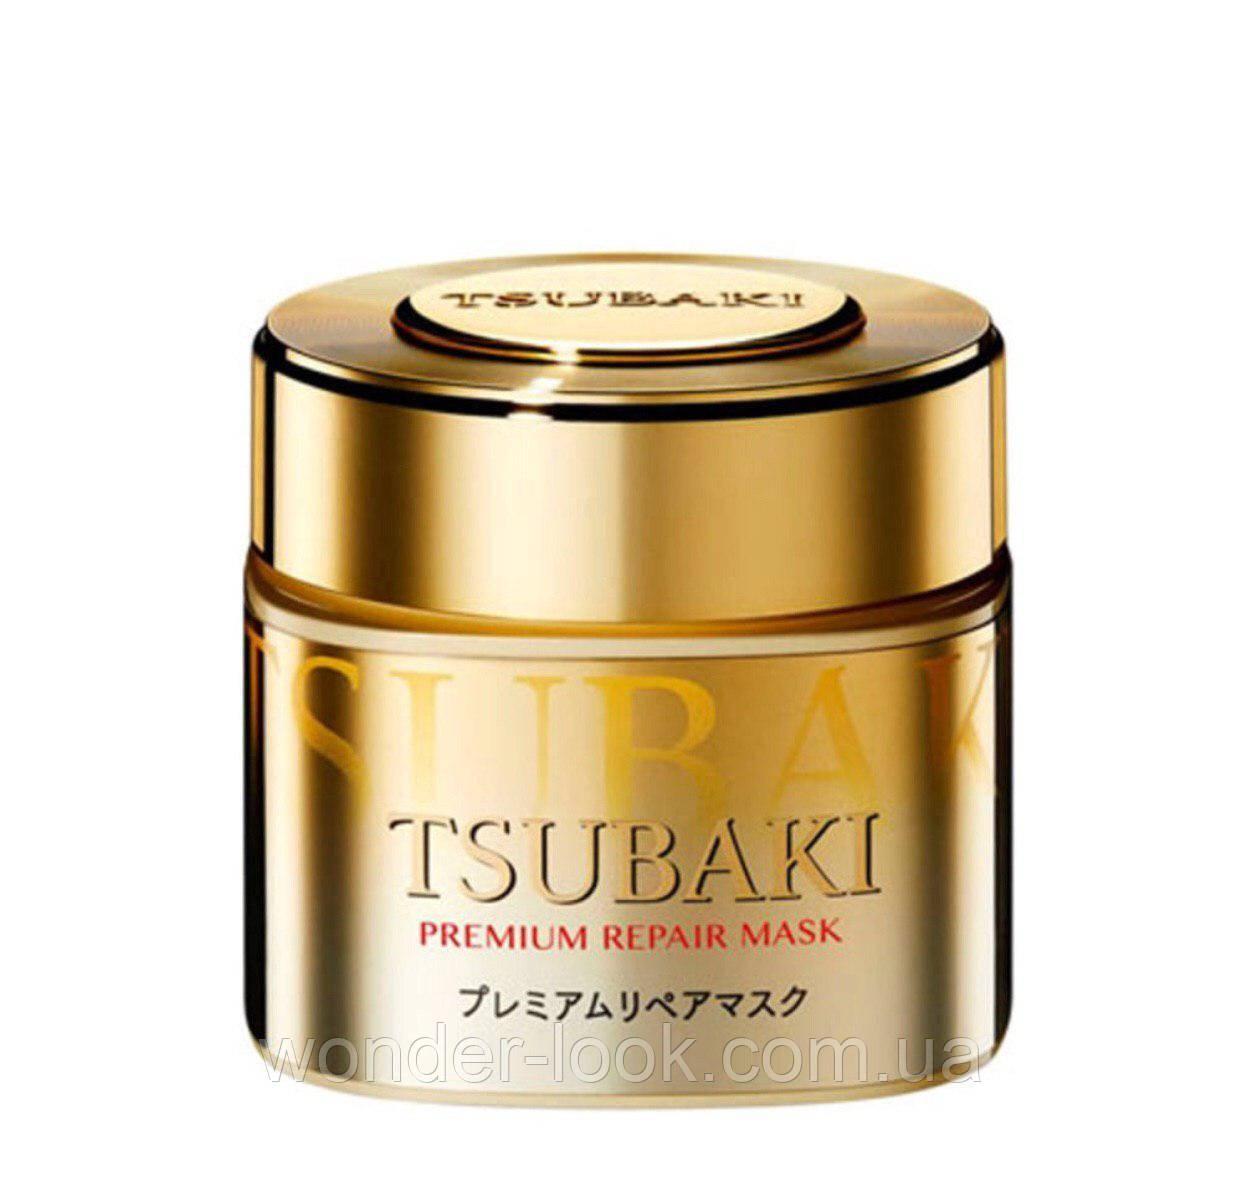 SHISEIDO TSUBAKI Premium Repair Mask Преміум маска для волосся, 180гр